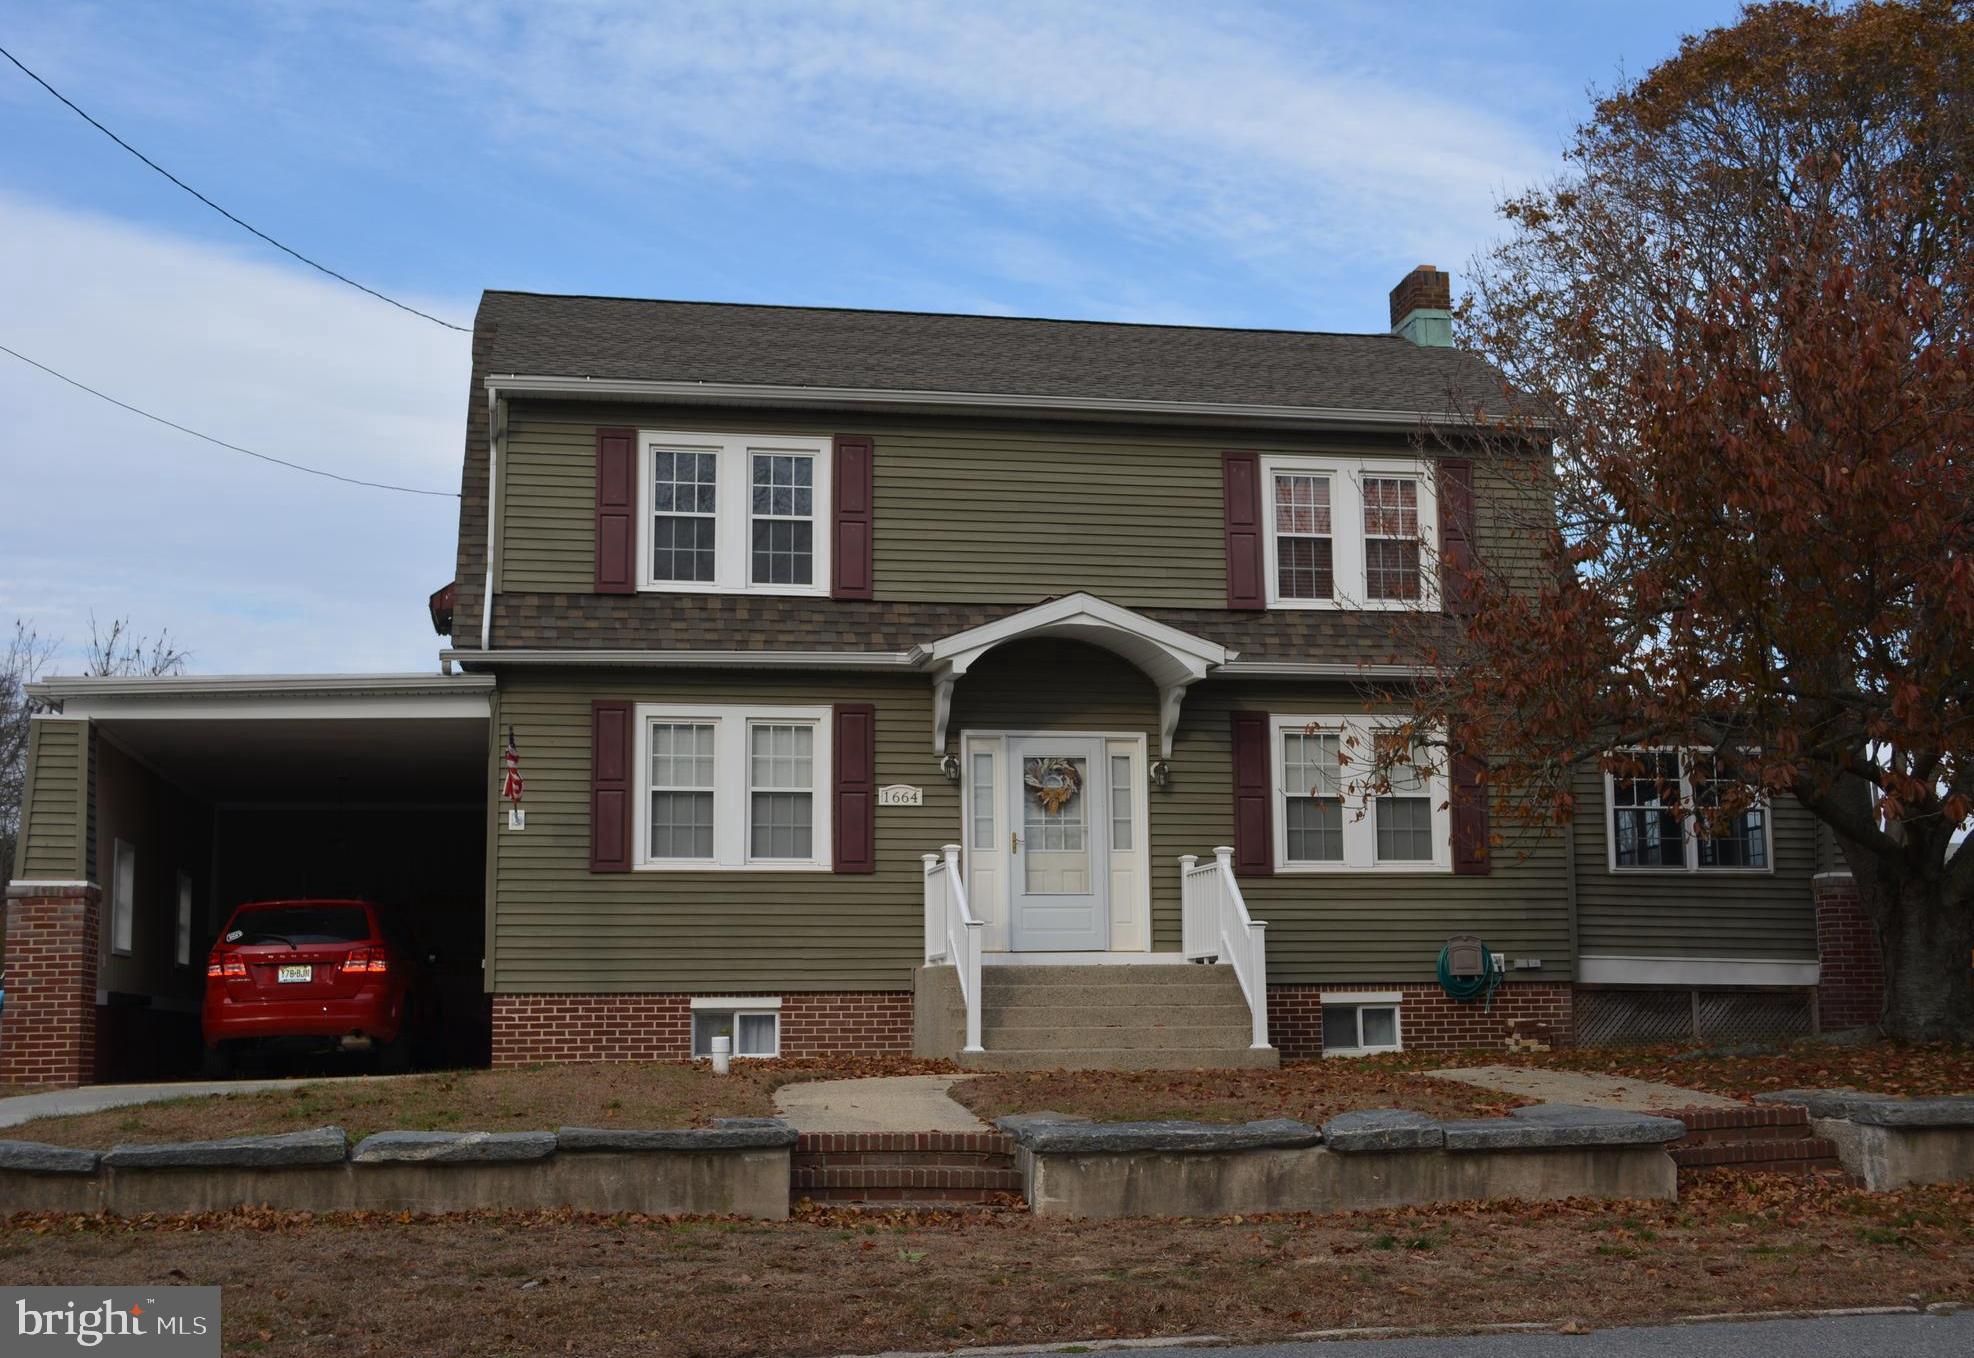 1664 MAIN STREET, PORT NORRIS, NJ 08349